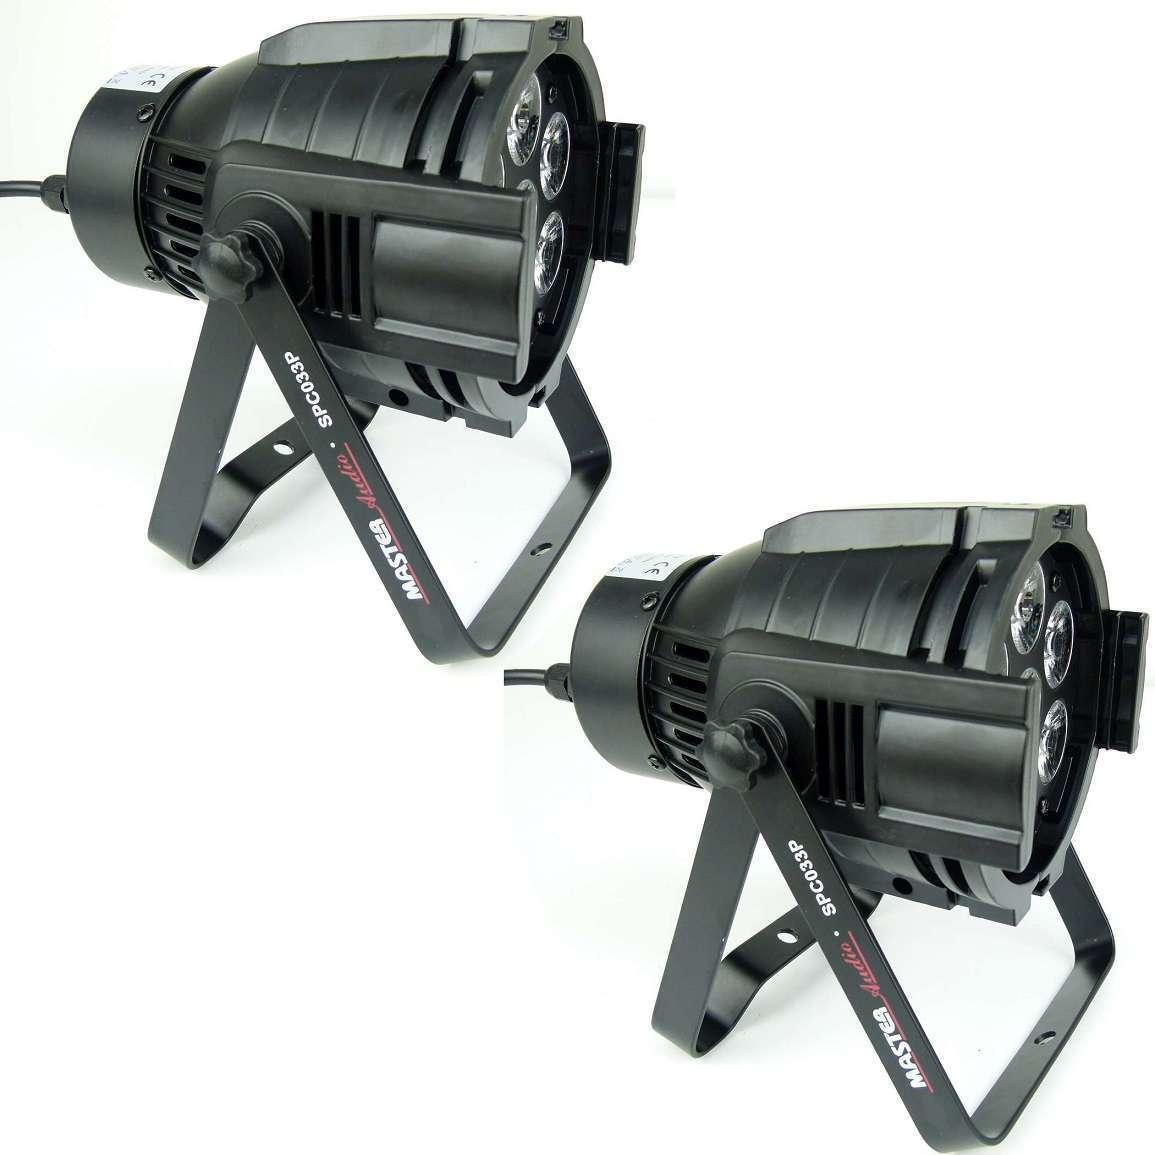 2 x DEL DMX 7 x 8 W RGBW Spotlight Phares Floor SPOT COULEUR DISCO